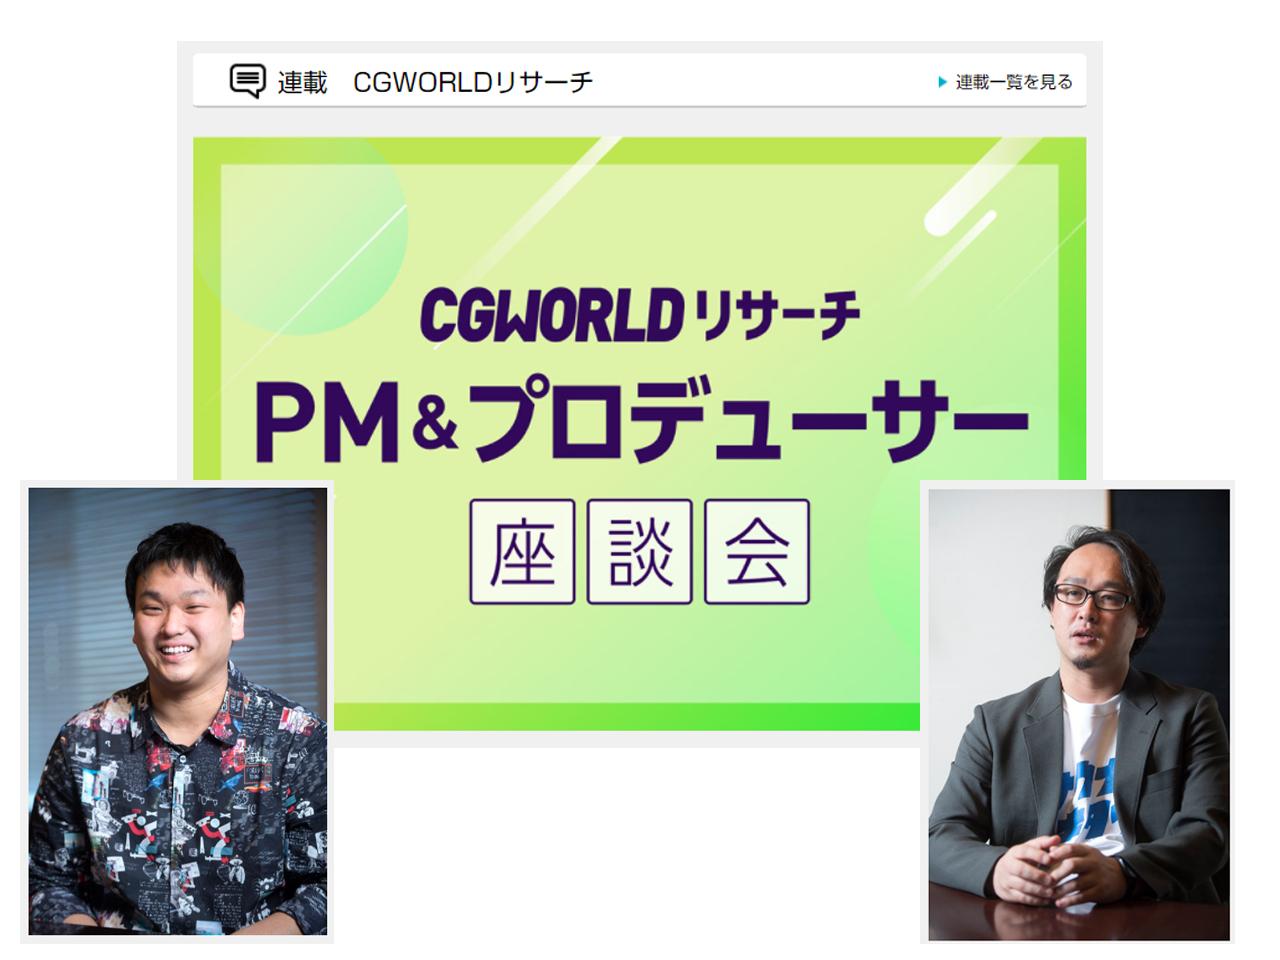 CGWORLD.jpの座談会に参加させていただきました